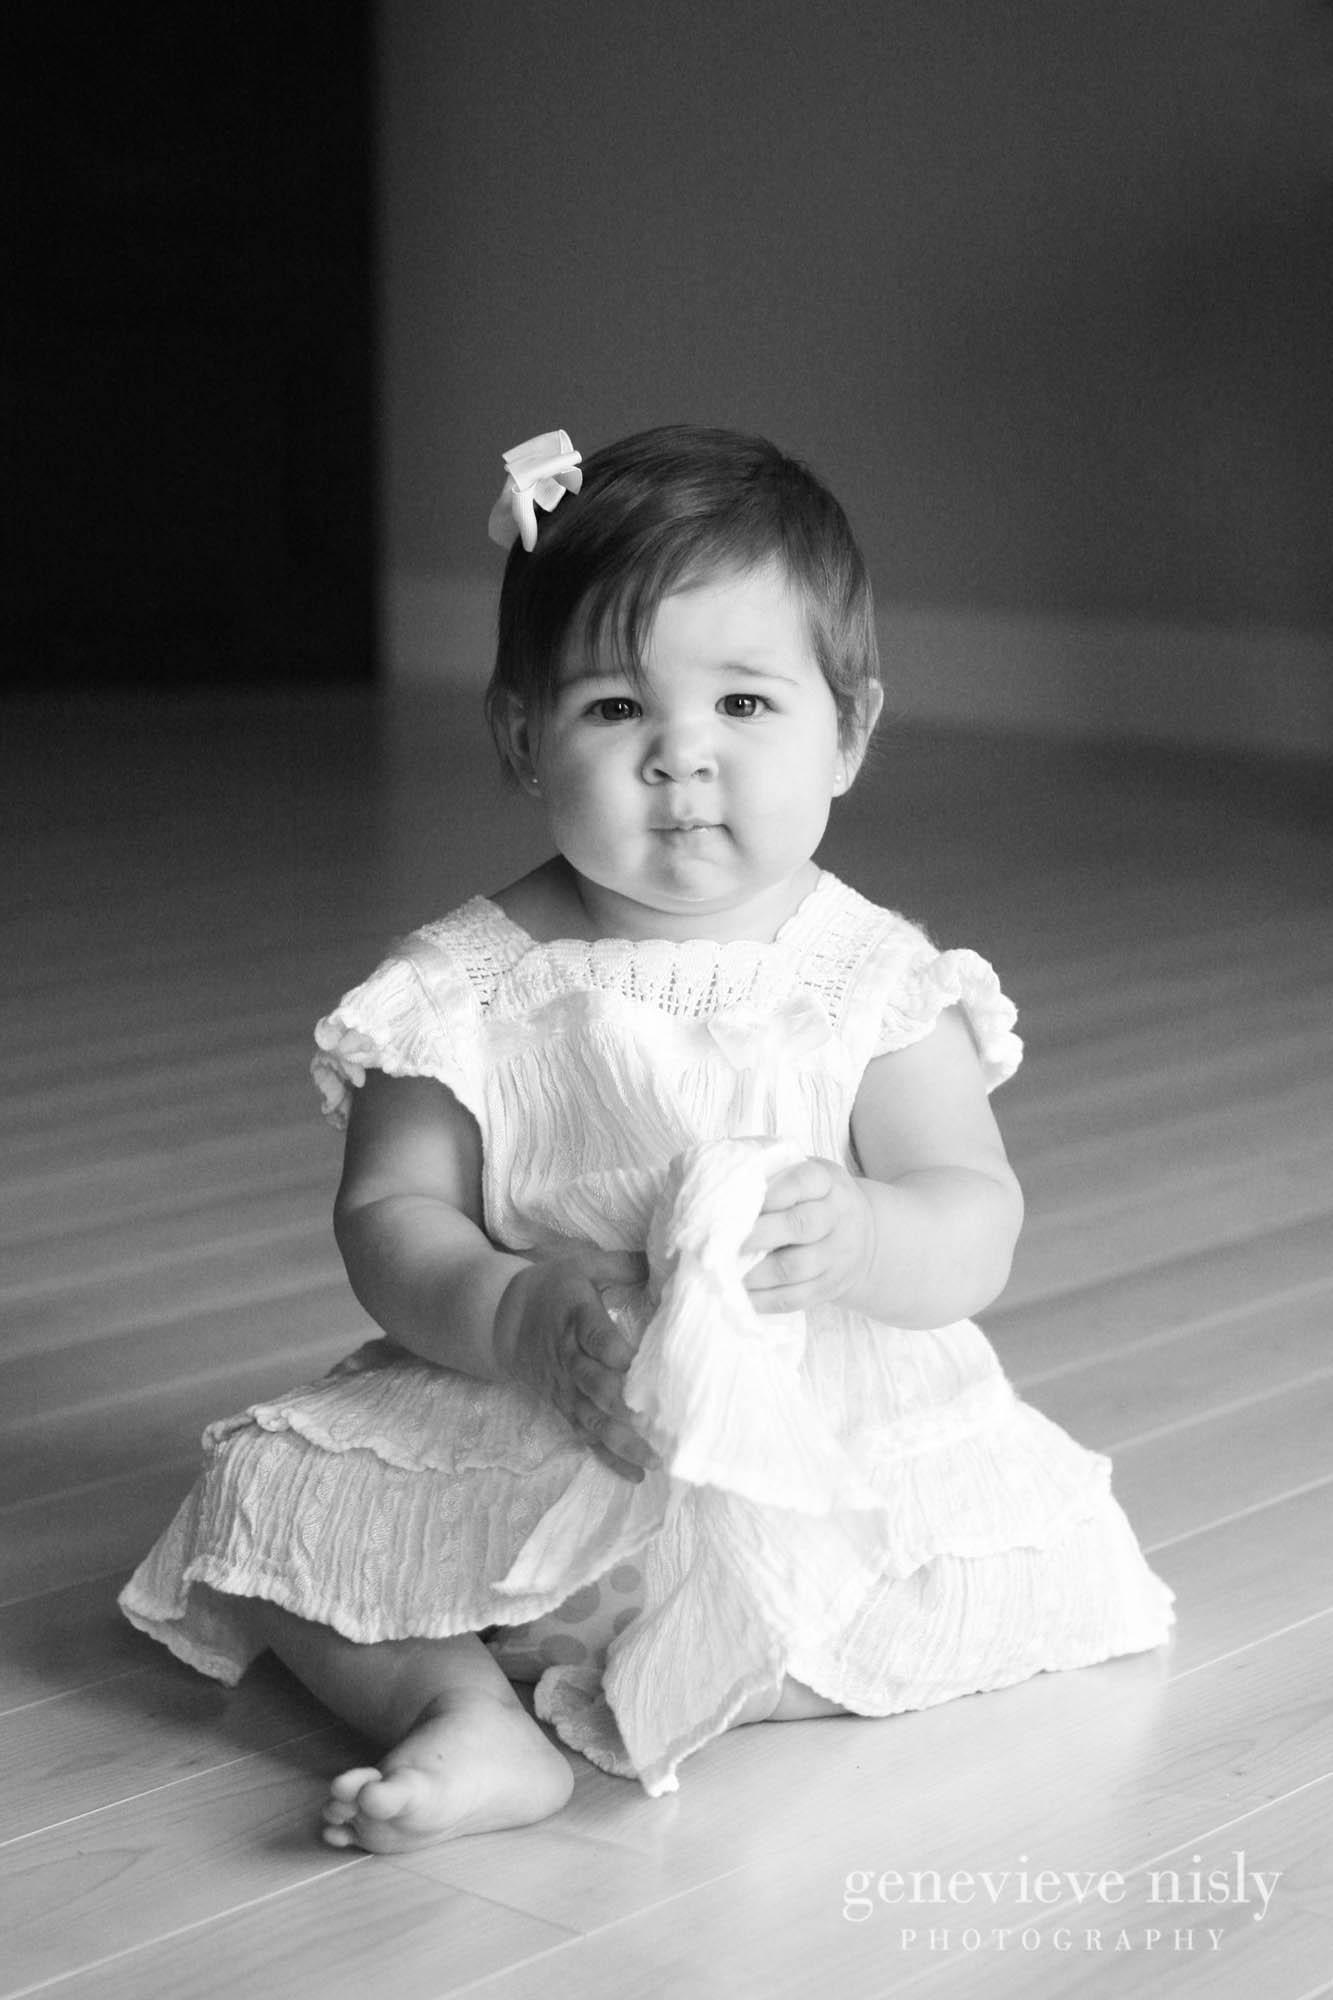 Copyright Genevieve Nisly Photography, Family, Green, Kids, Ohio, Portraits